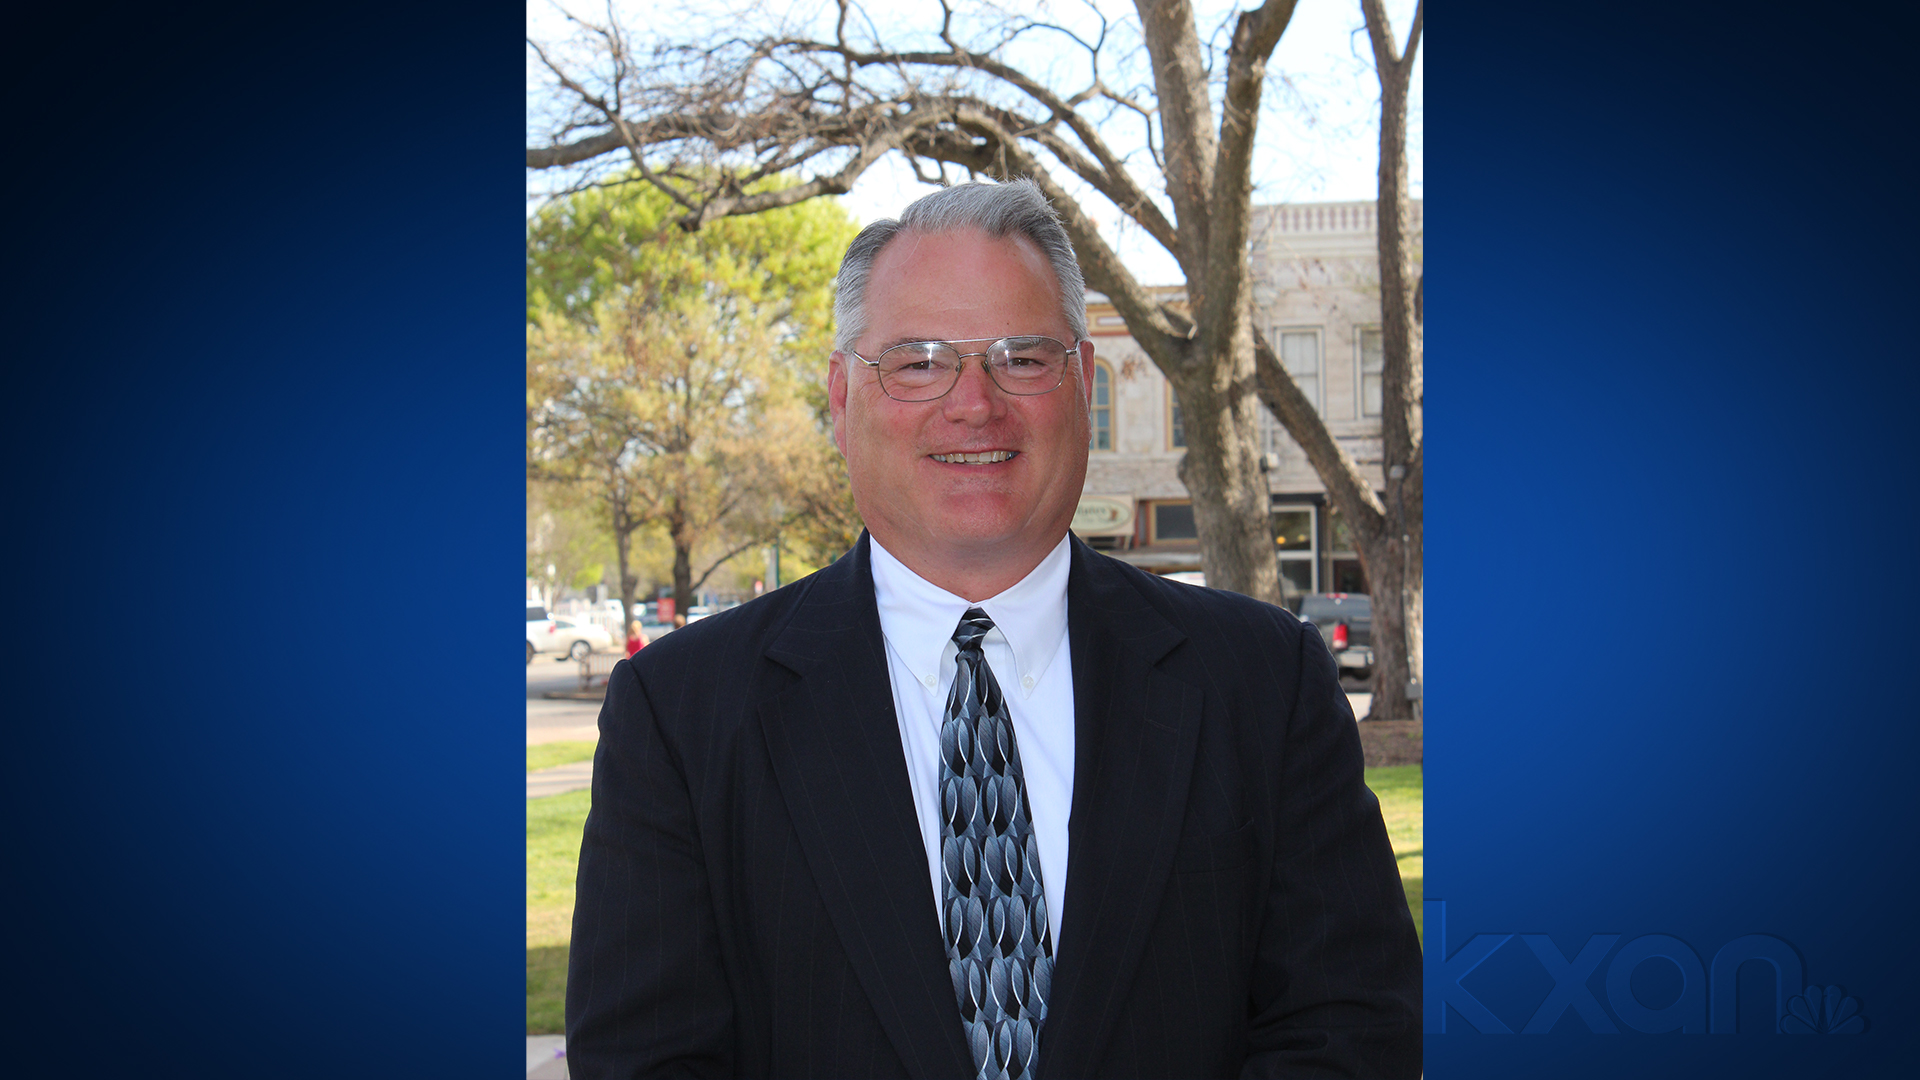 Kevin Stofle. (Photo courtesy of Williamson County